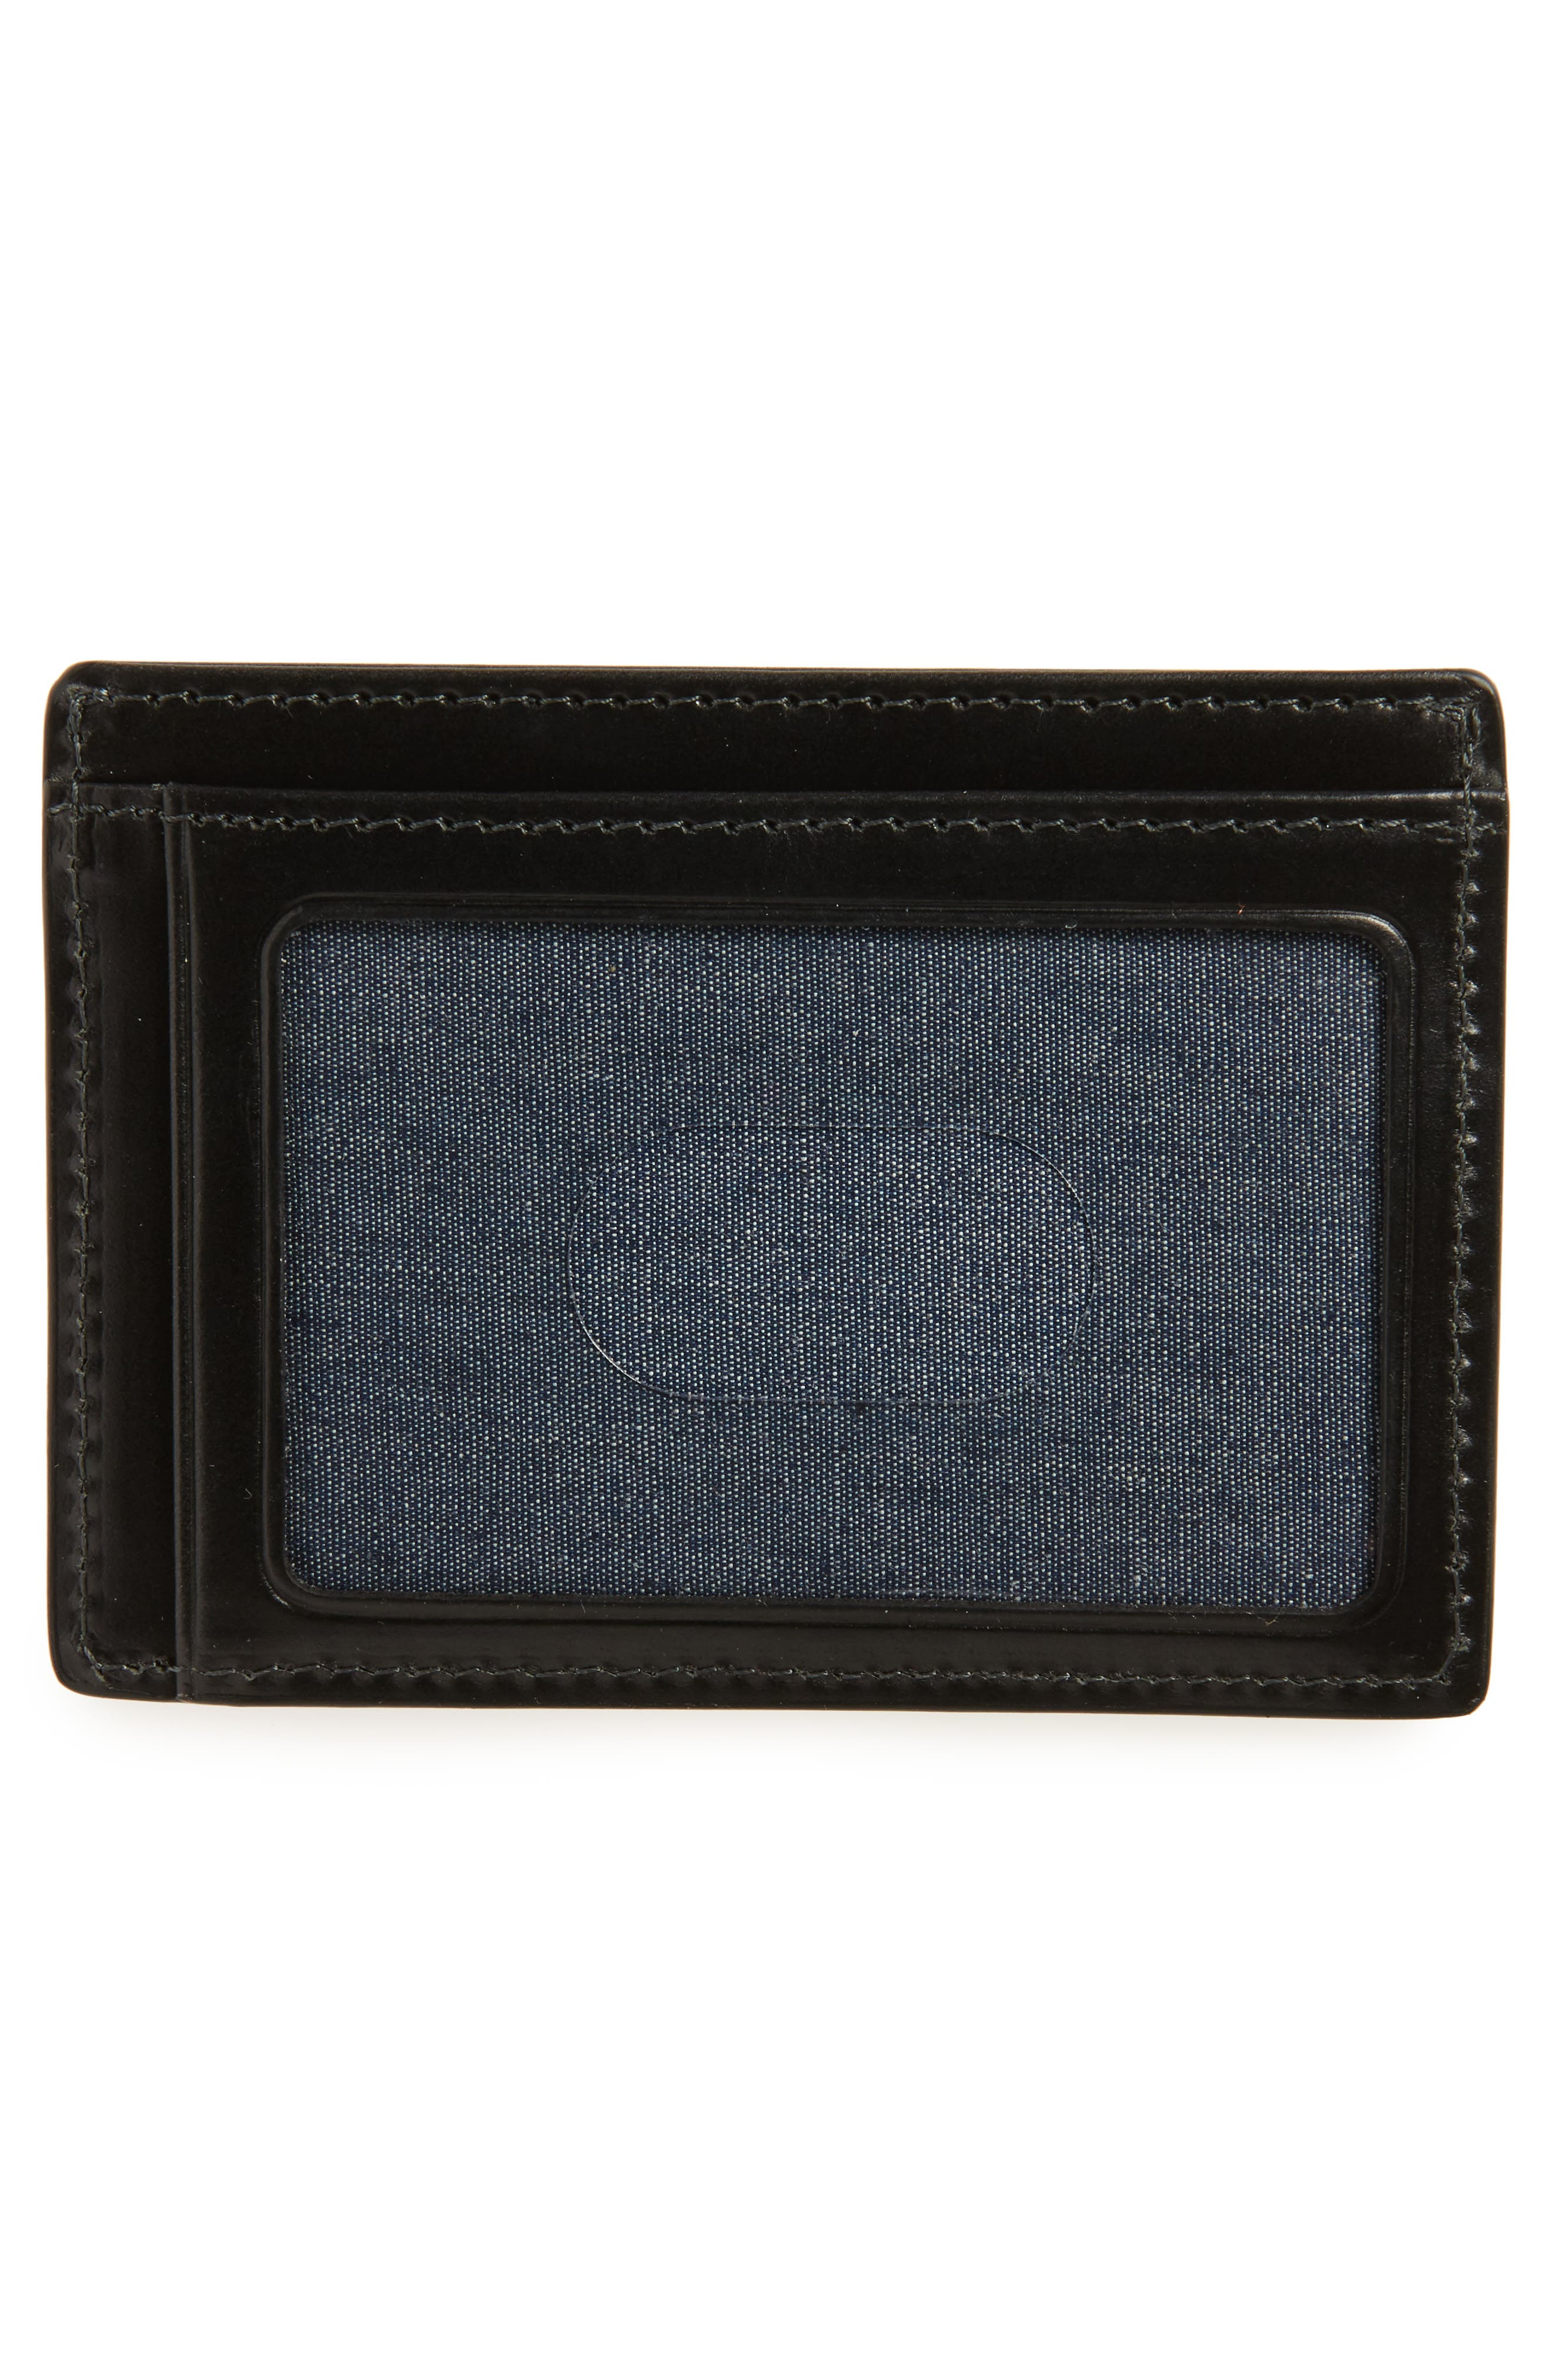 Wyatt RFID Card Case,                             Alternate thumbnail 2, color,                             BLACK